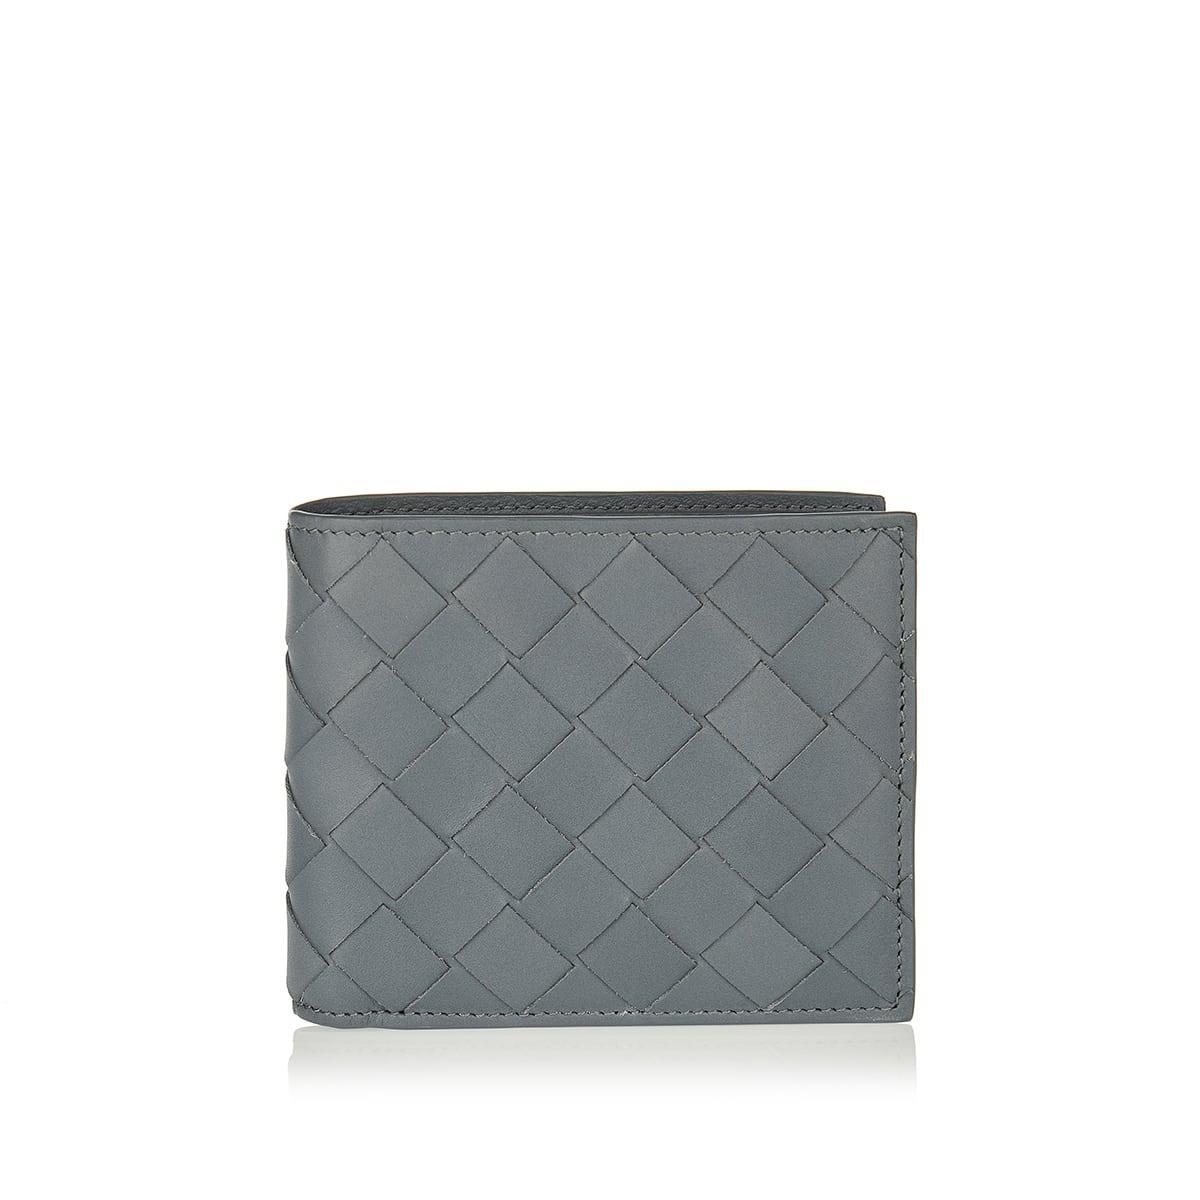 Bi-fold Intrecciato leather wallet